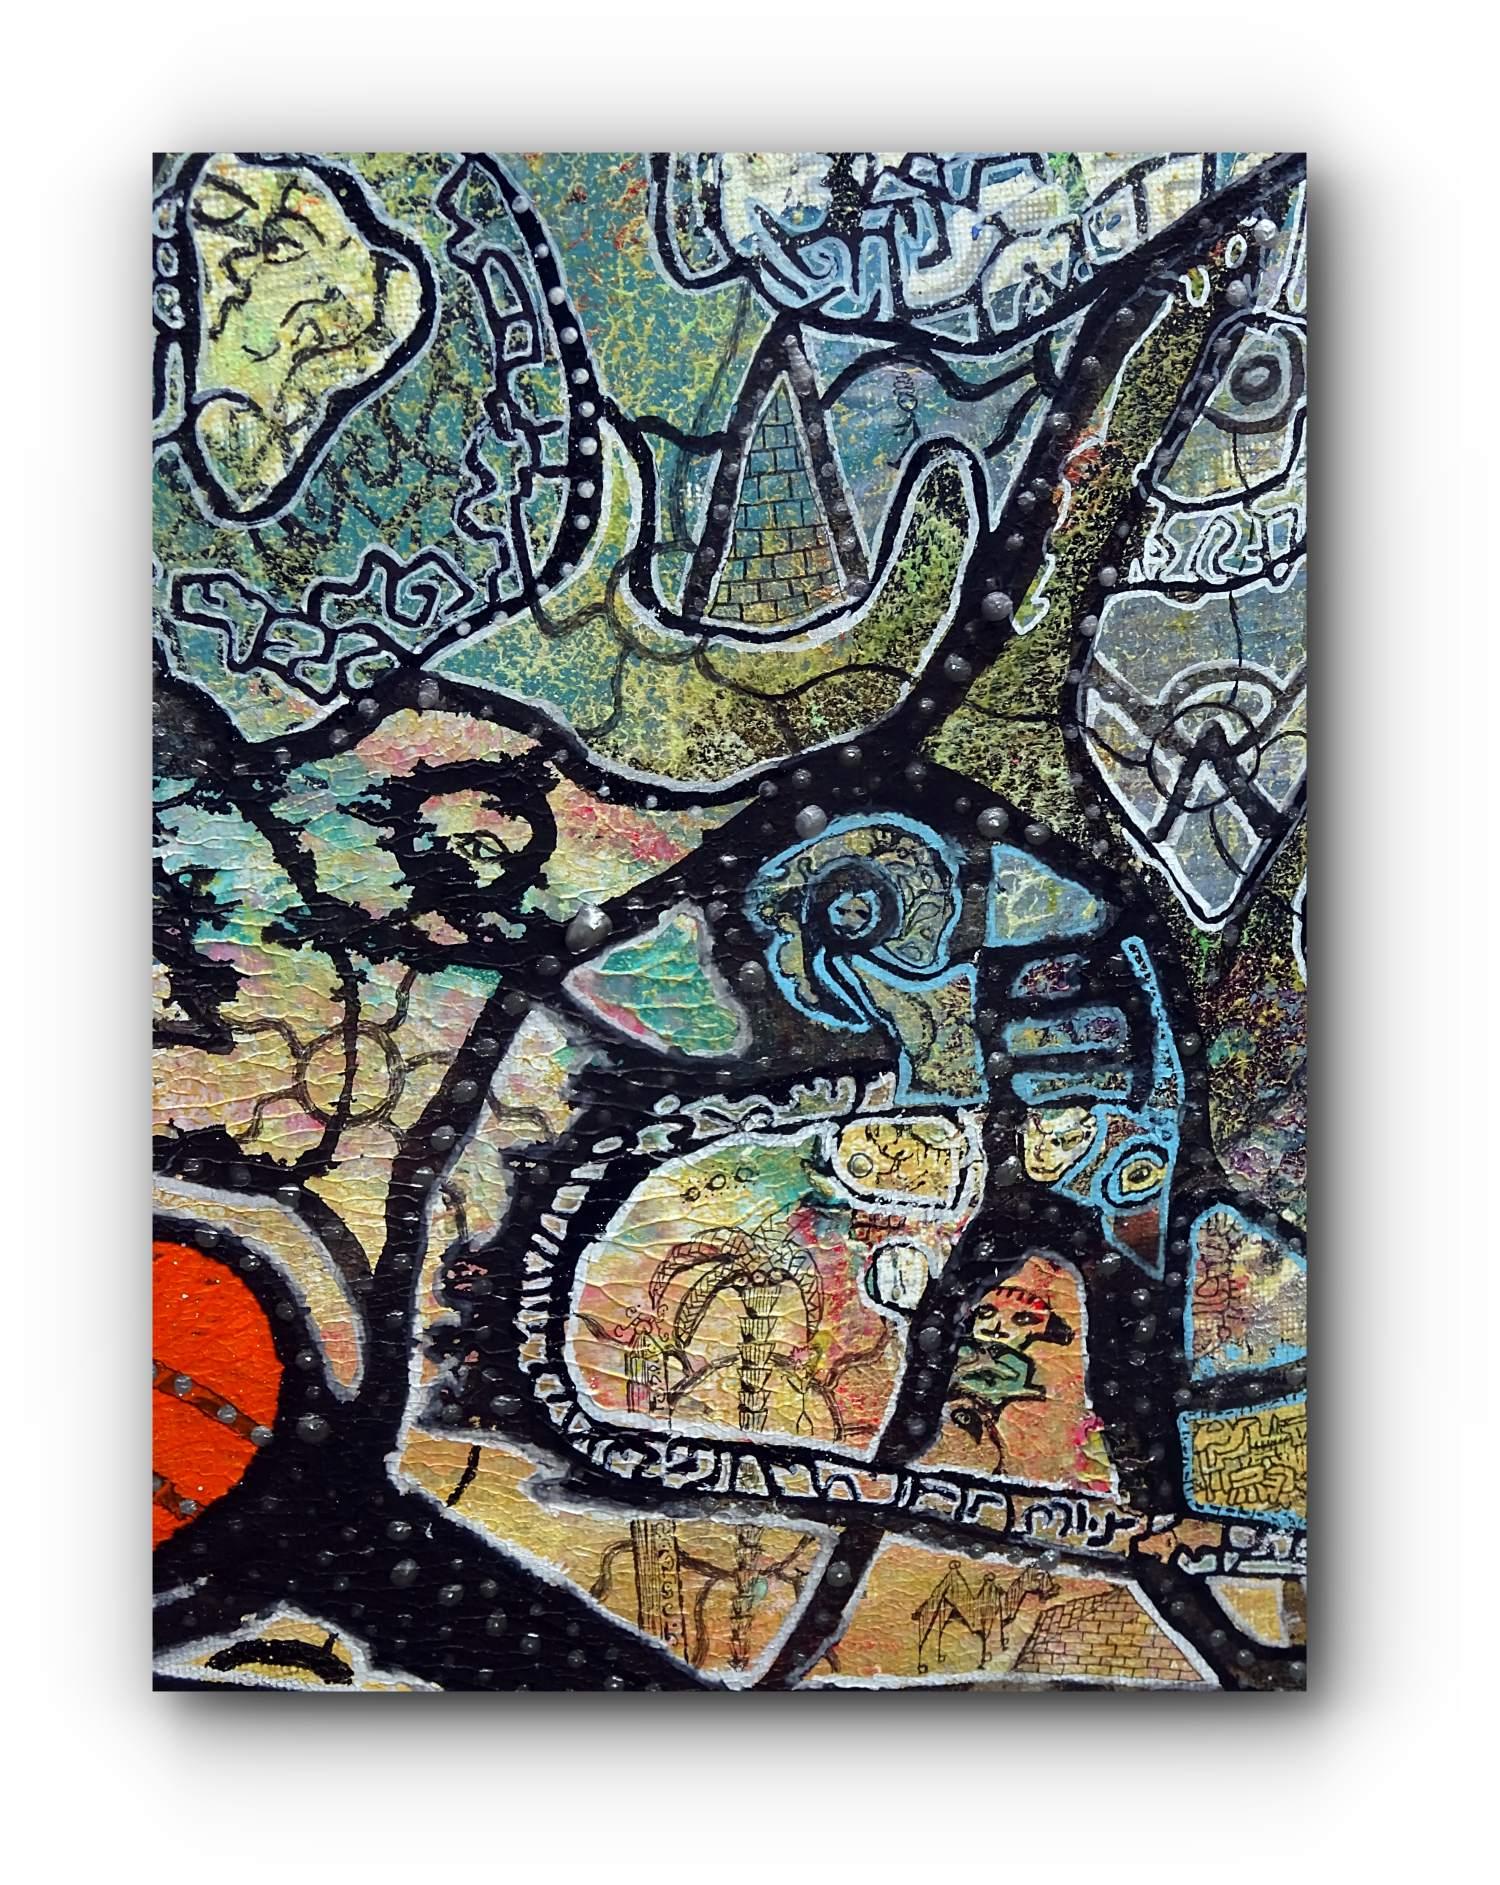 painting-detail-10-desert-dwellers-artists-ingress-vortices.jpg